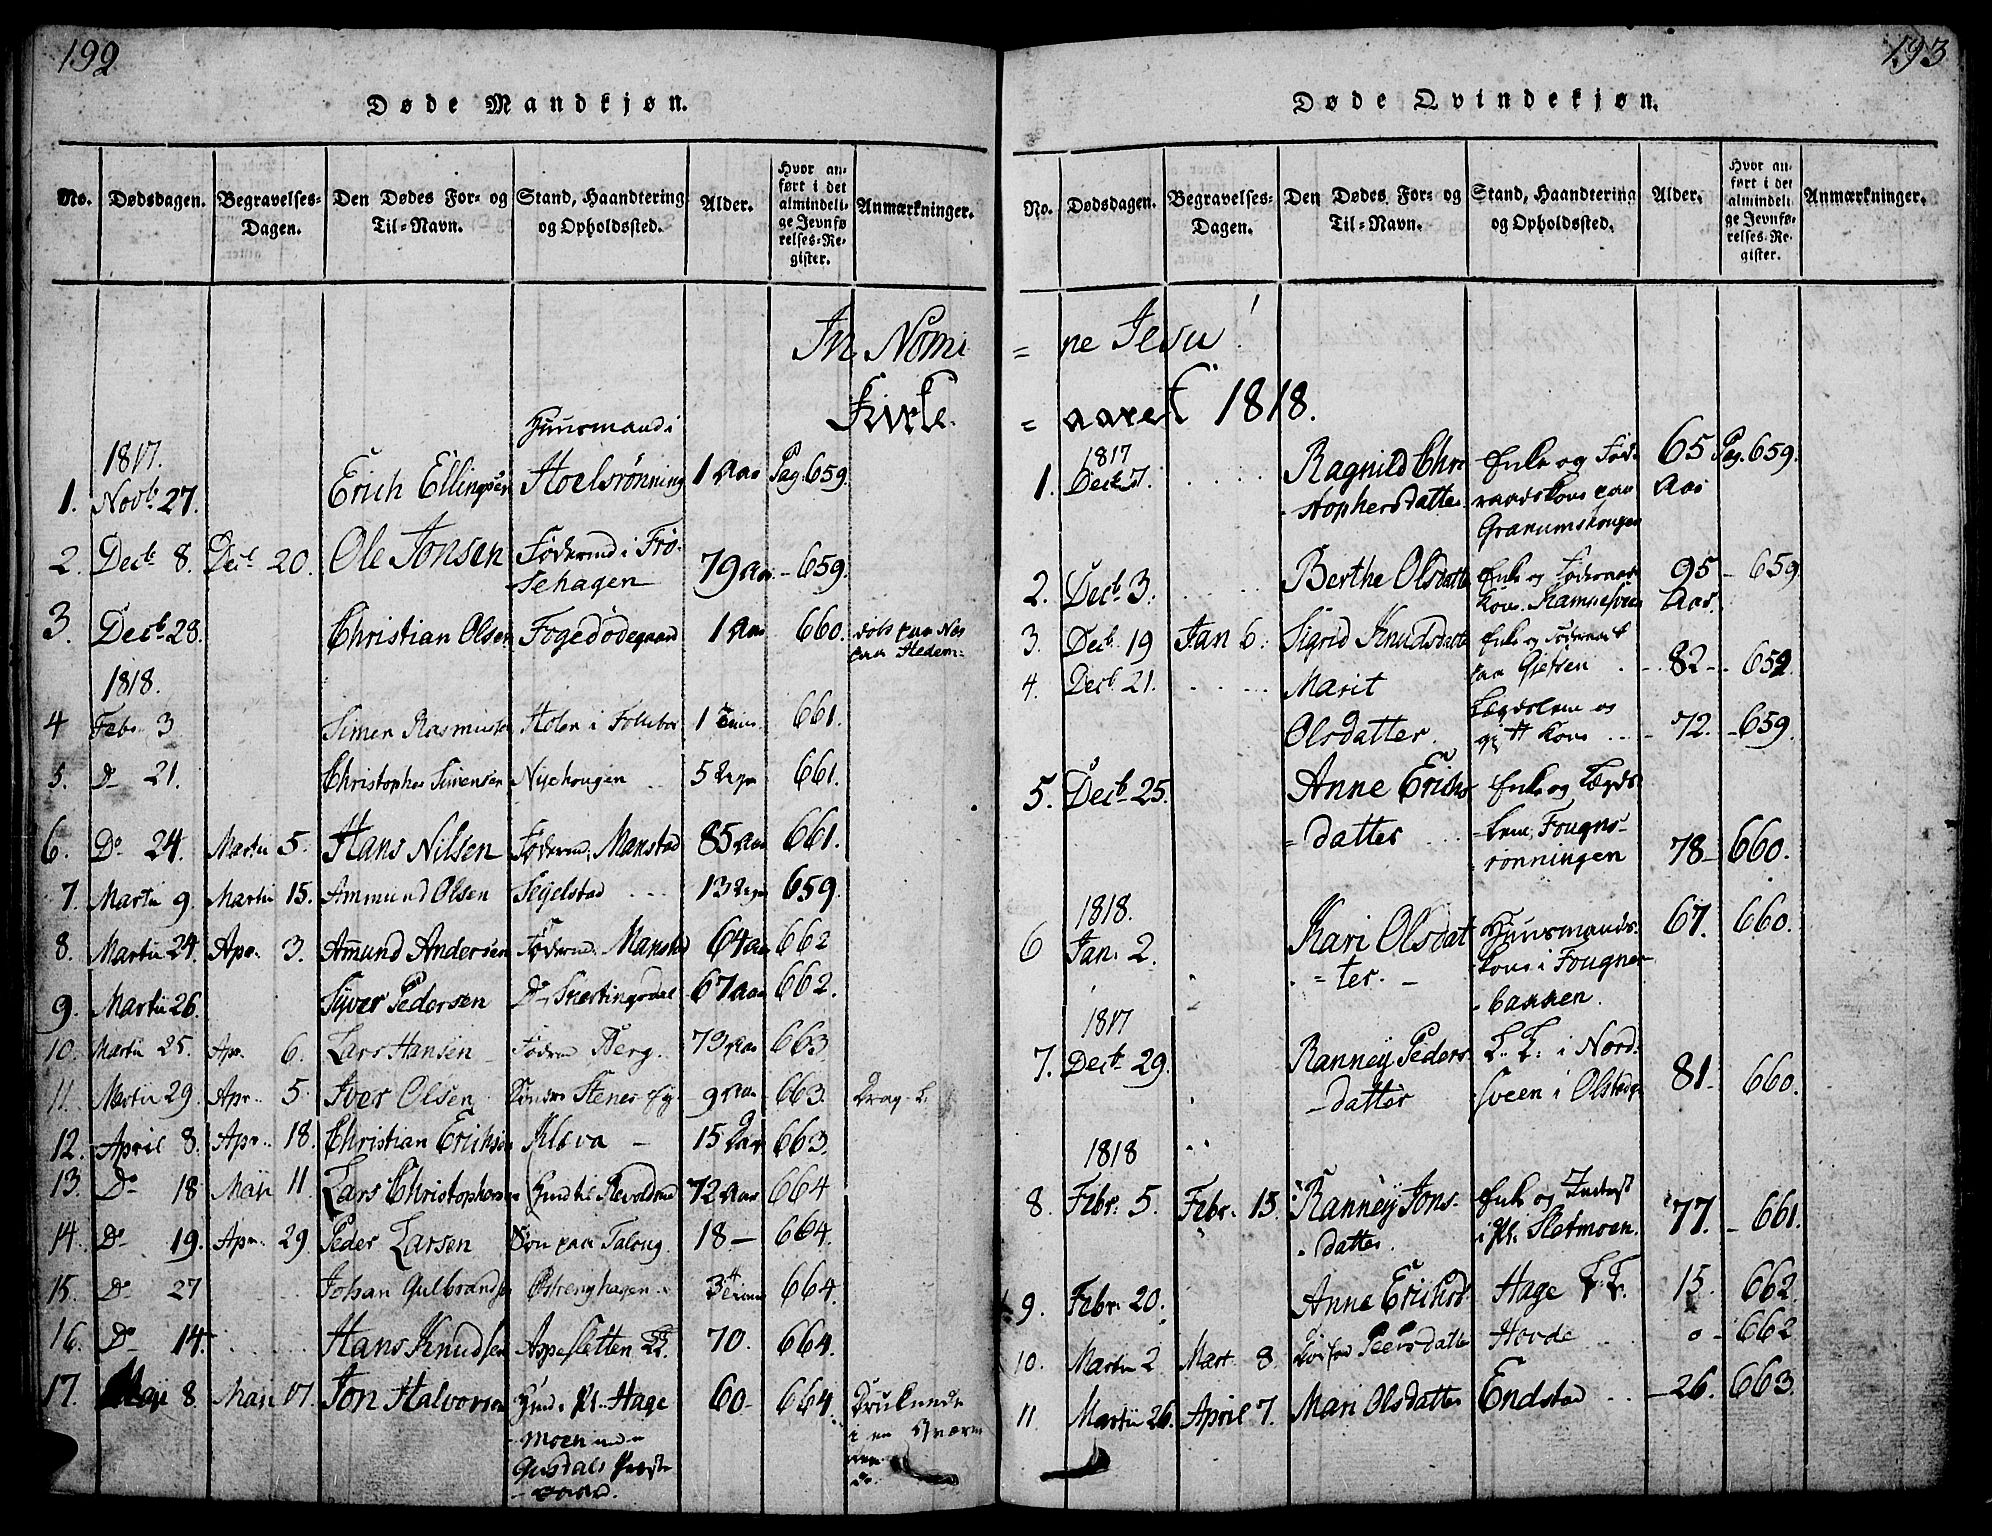 SAH, Gausdal prestekontor, Ministerialbok nr. 5, 1817-1829, s. 192-193